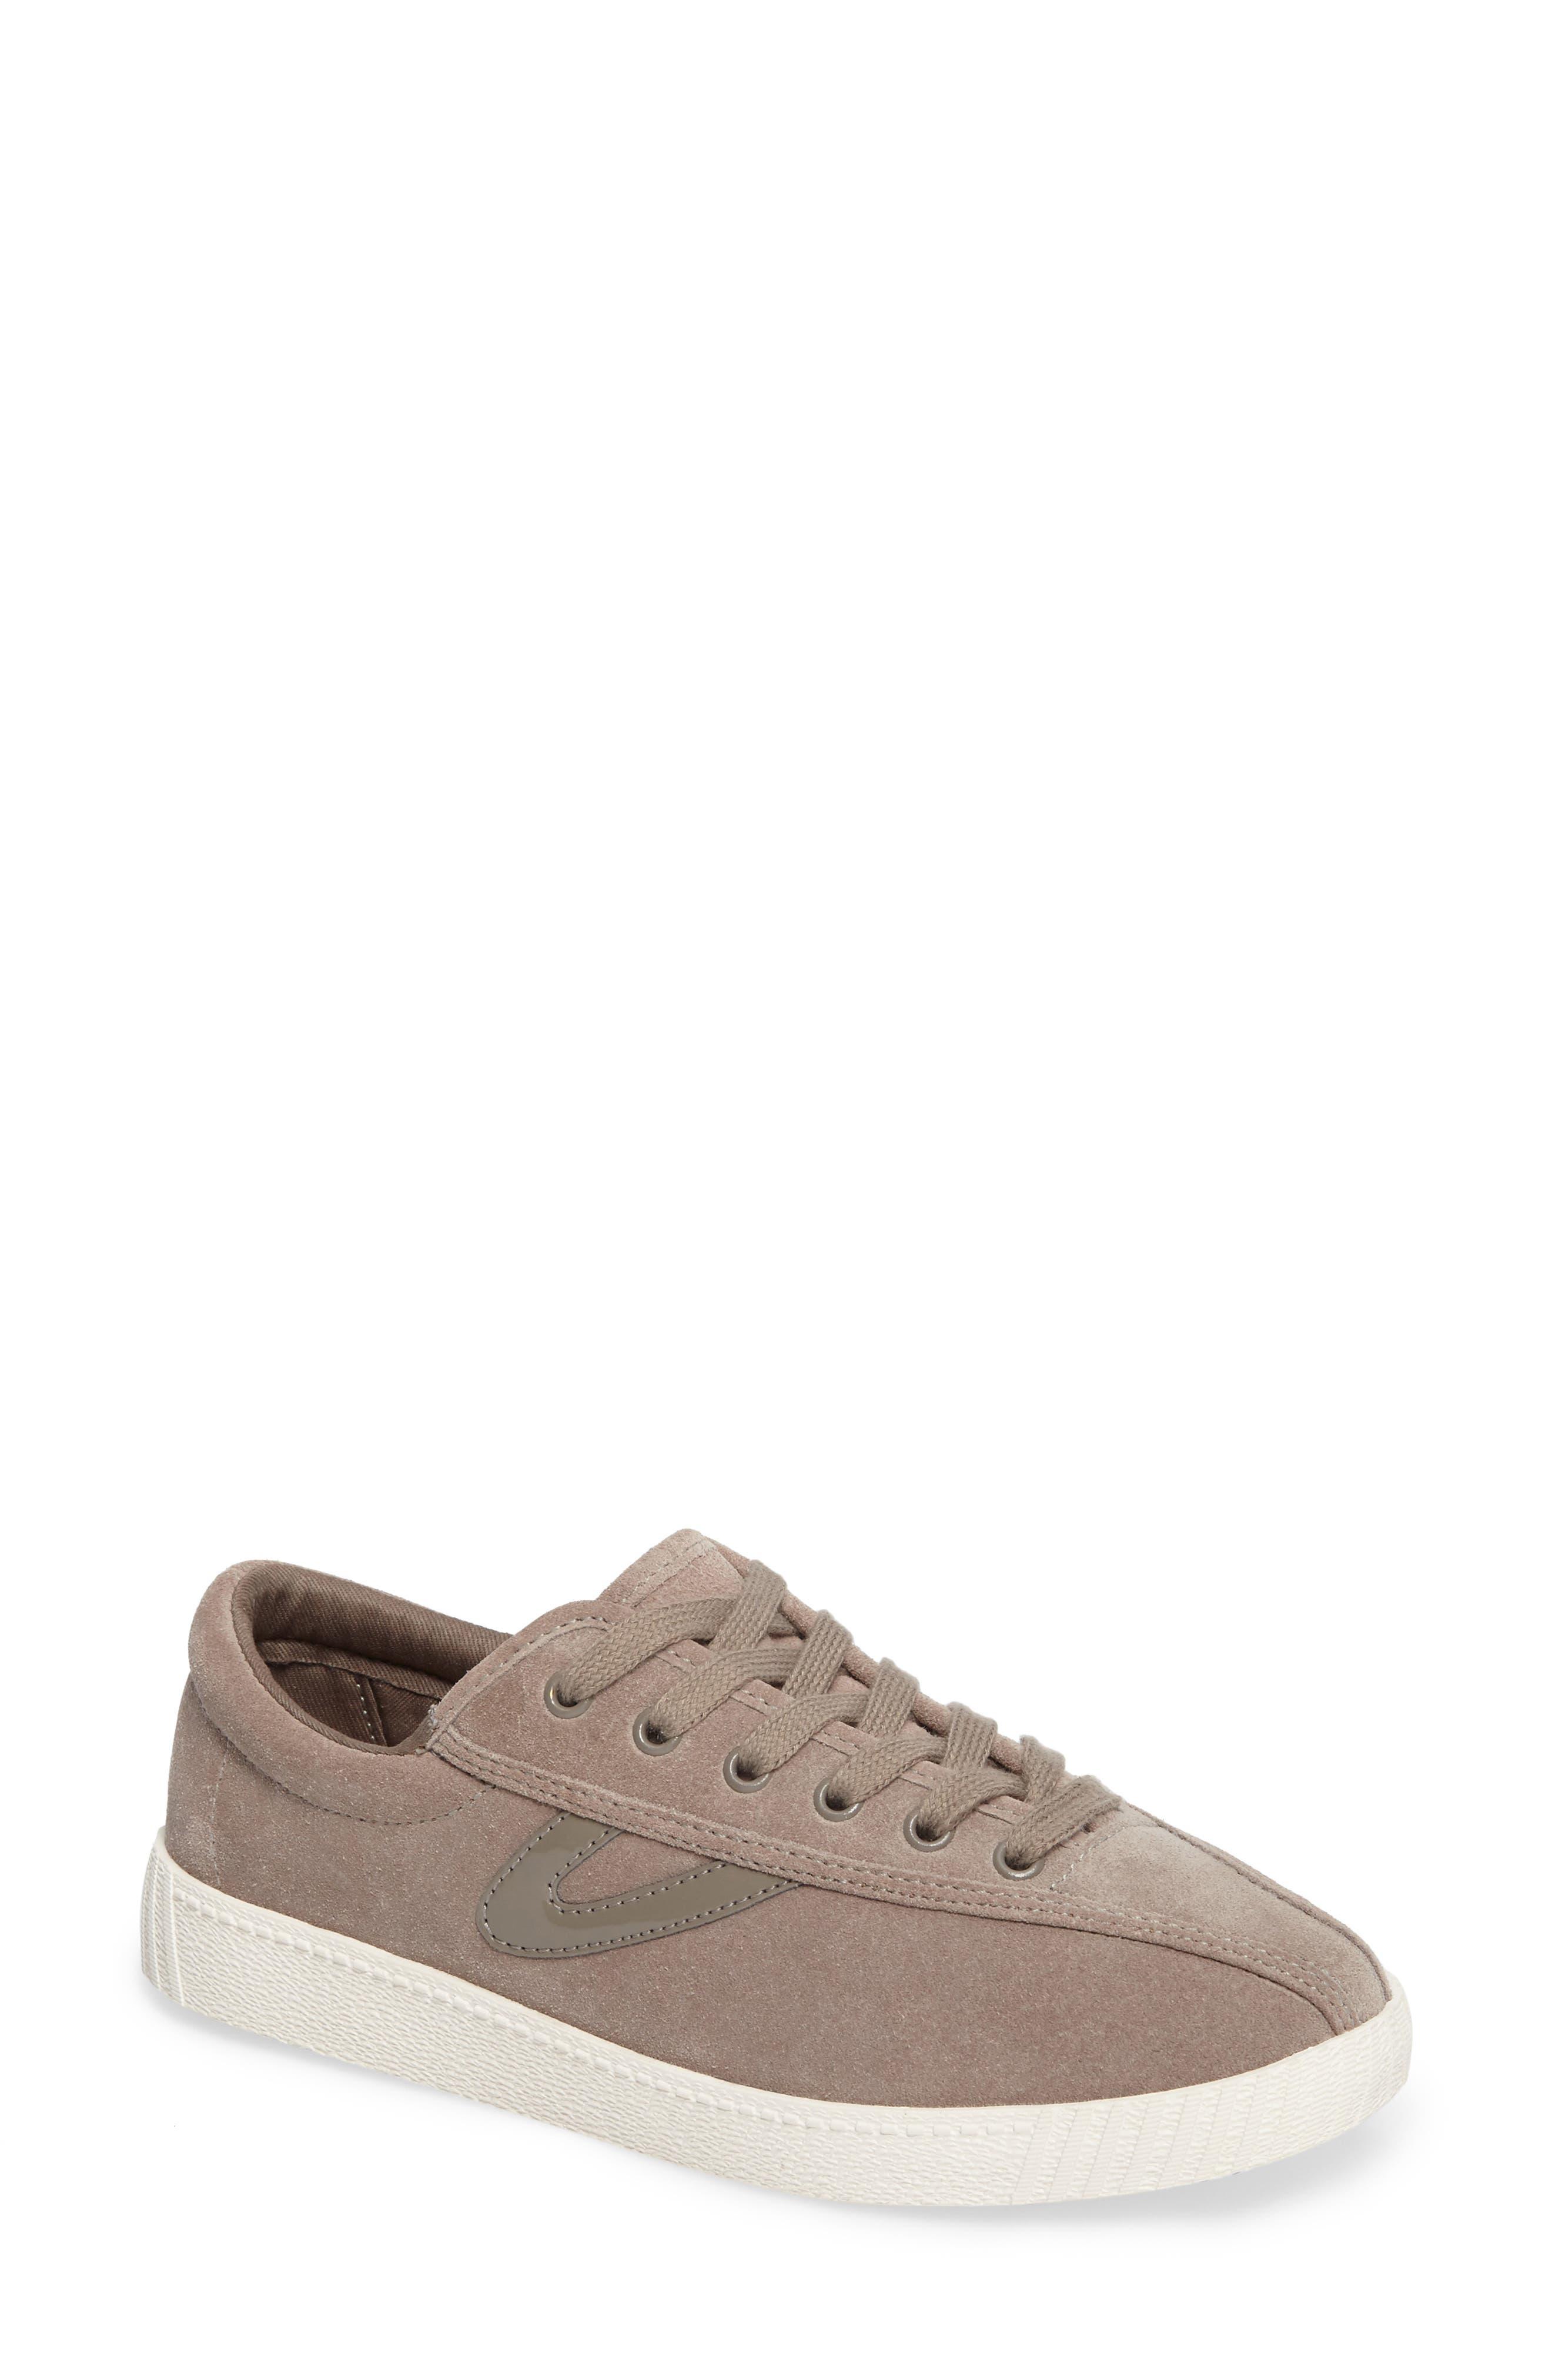 Main Image - Tretorn 'Nylite2 Plus' Sneaker (Women)